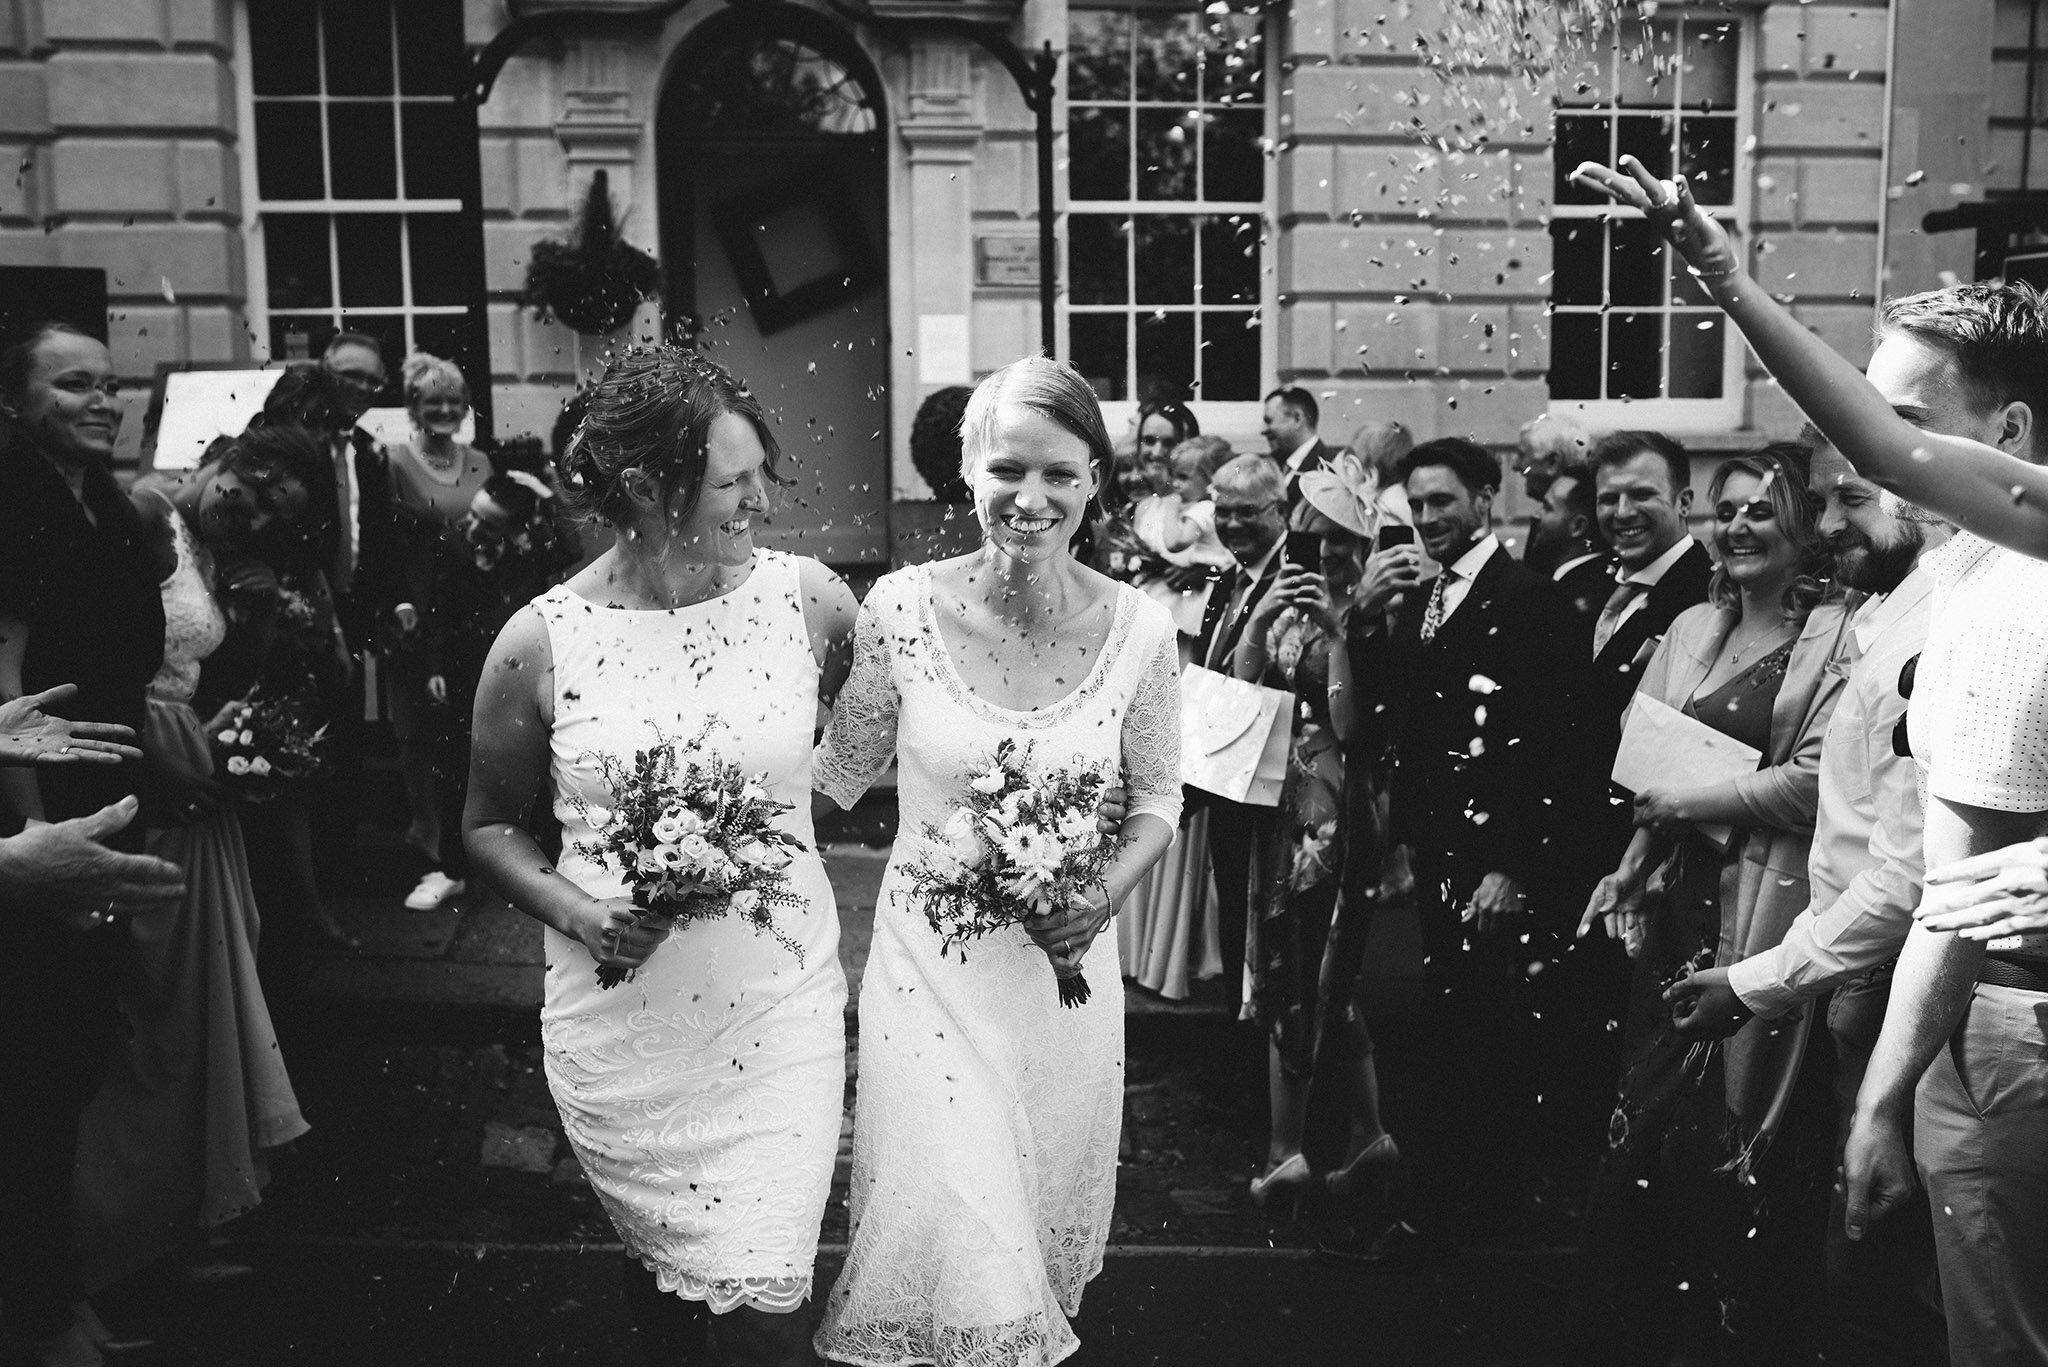 Scott-Stockwell-Photography-wedding-photographer-becky-rachel.jpg